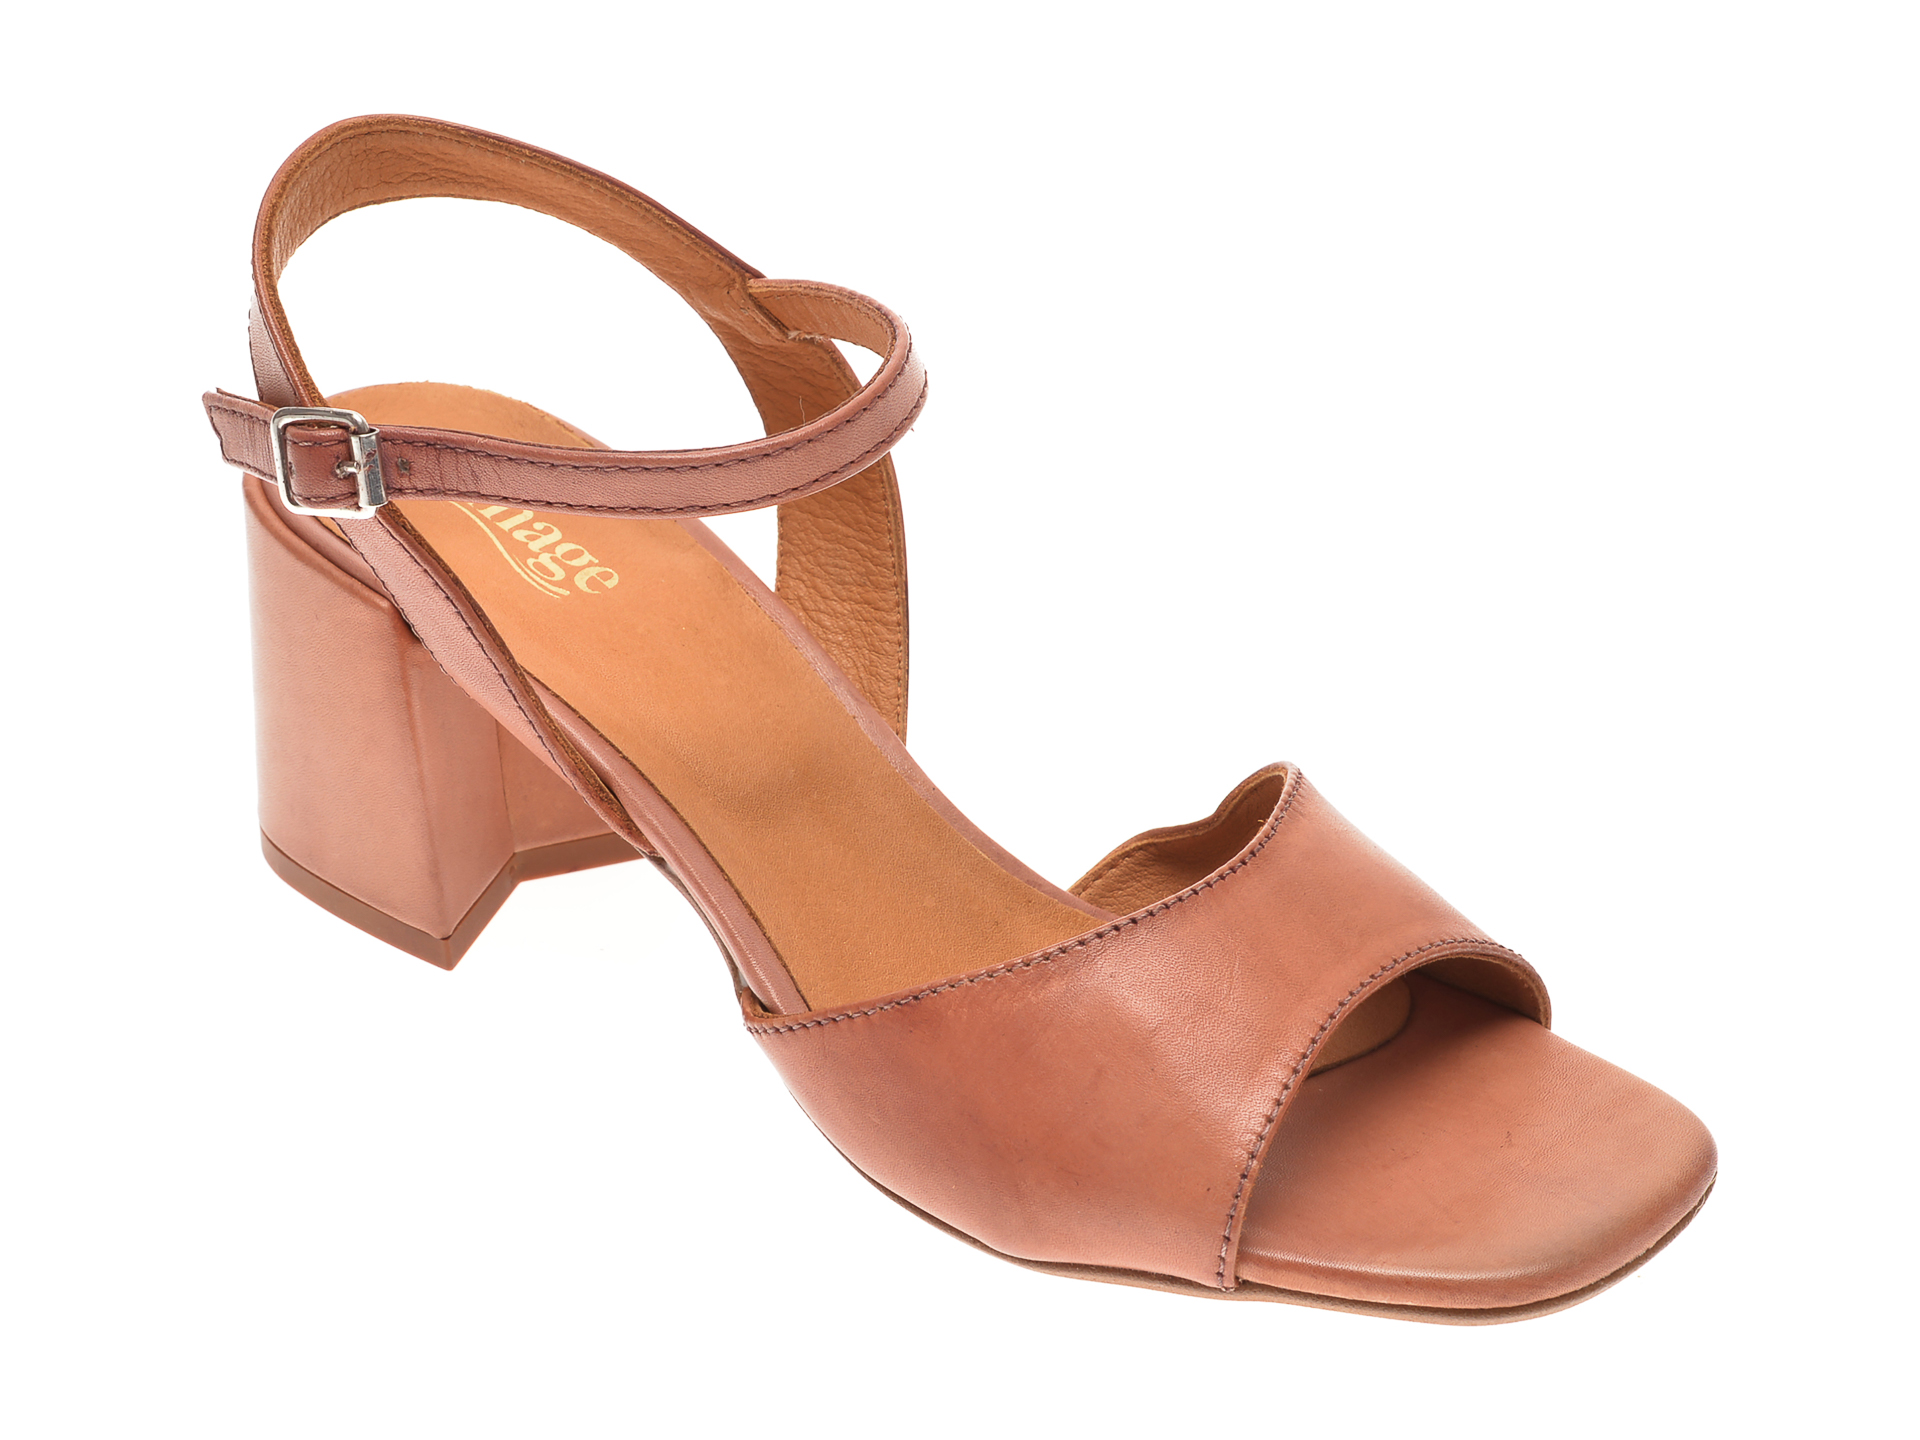 Sandale IMAGE maro, 2219, din piele naturala imagine